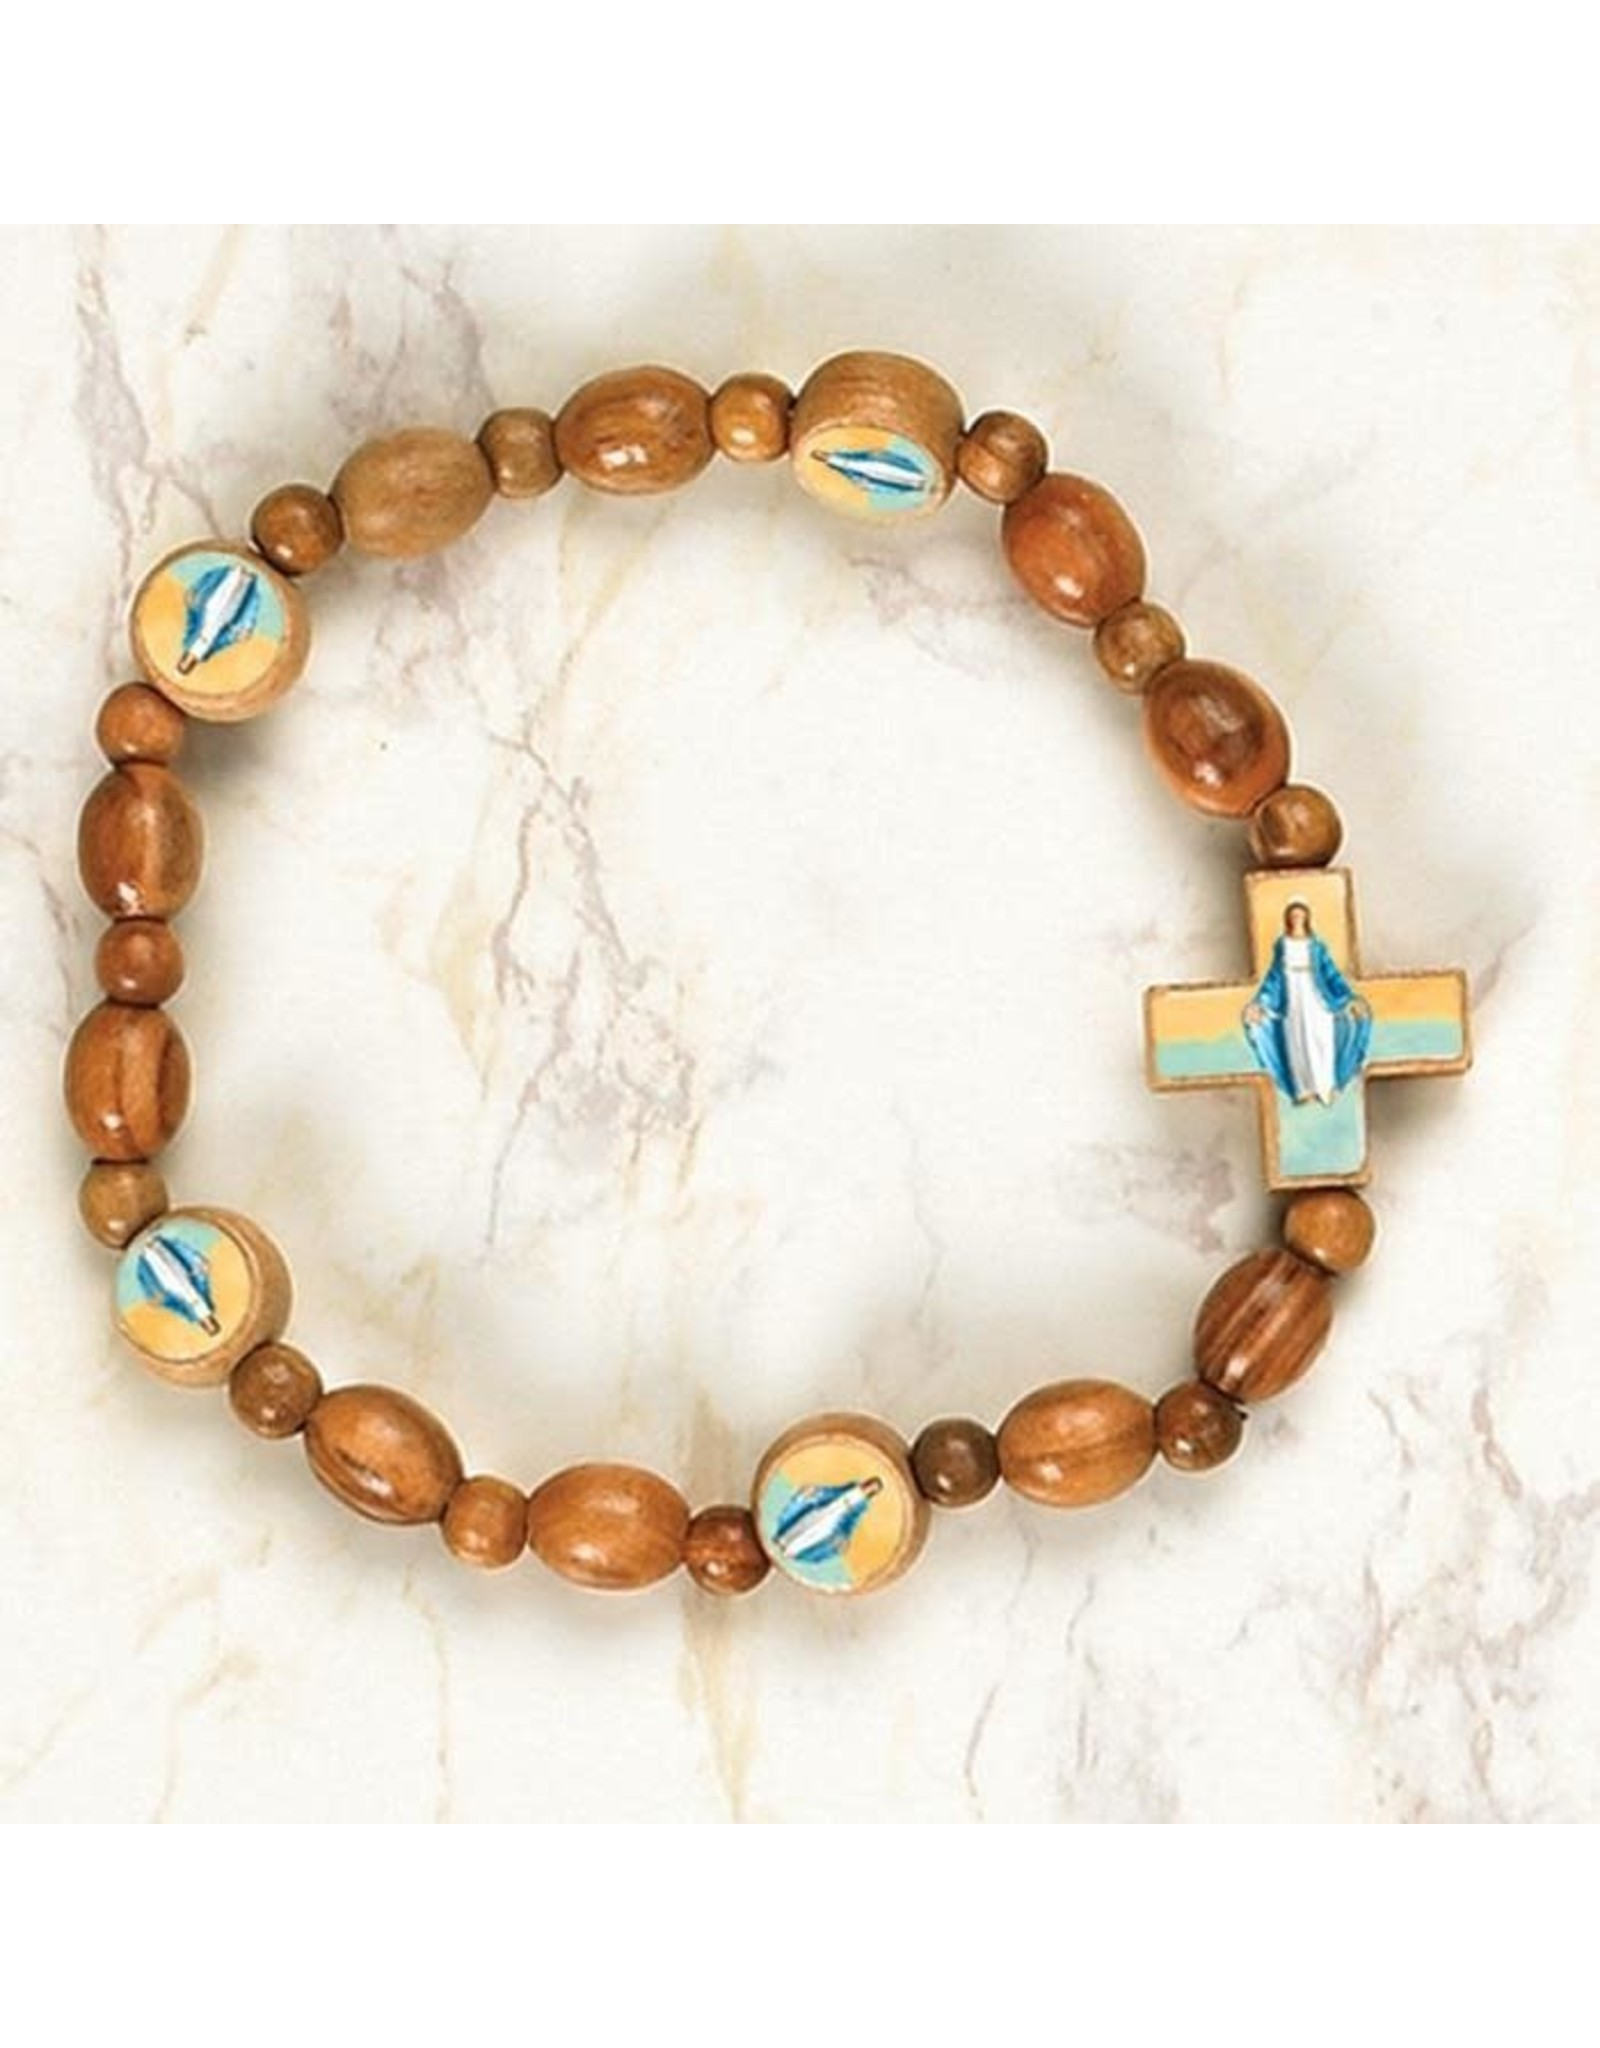 Lady of Grace - Italian Wood Saint Stretch Bracelets